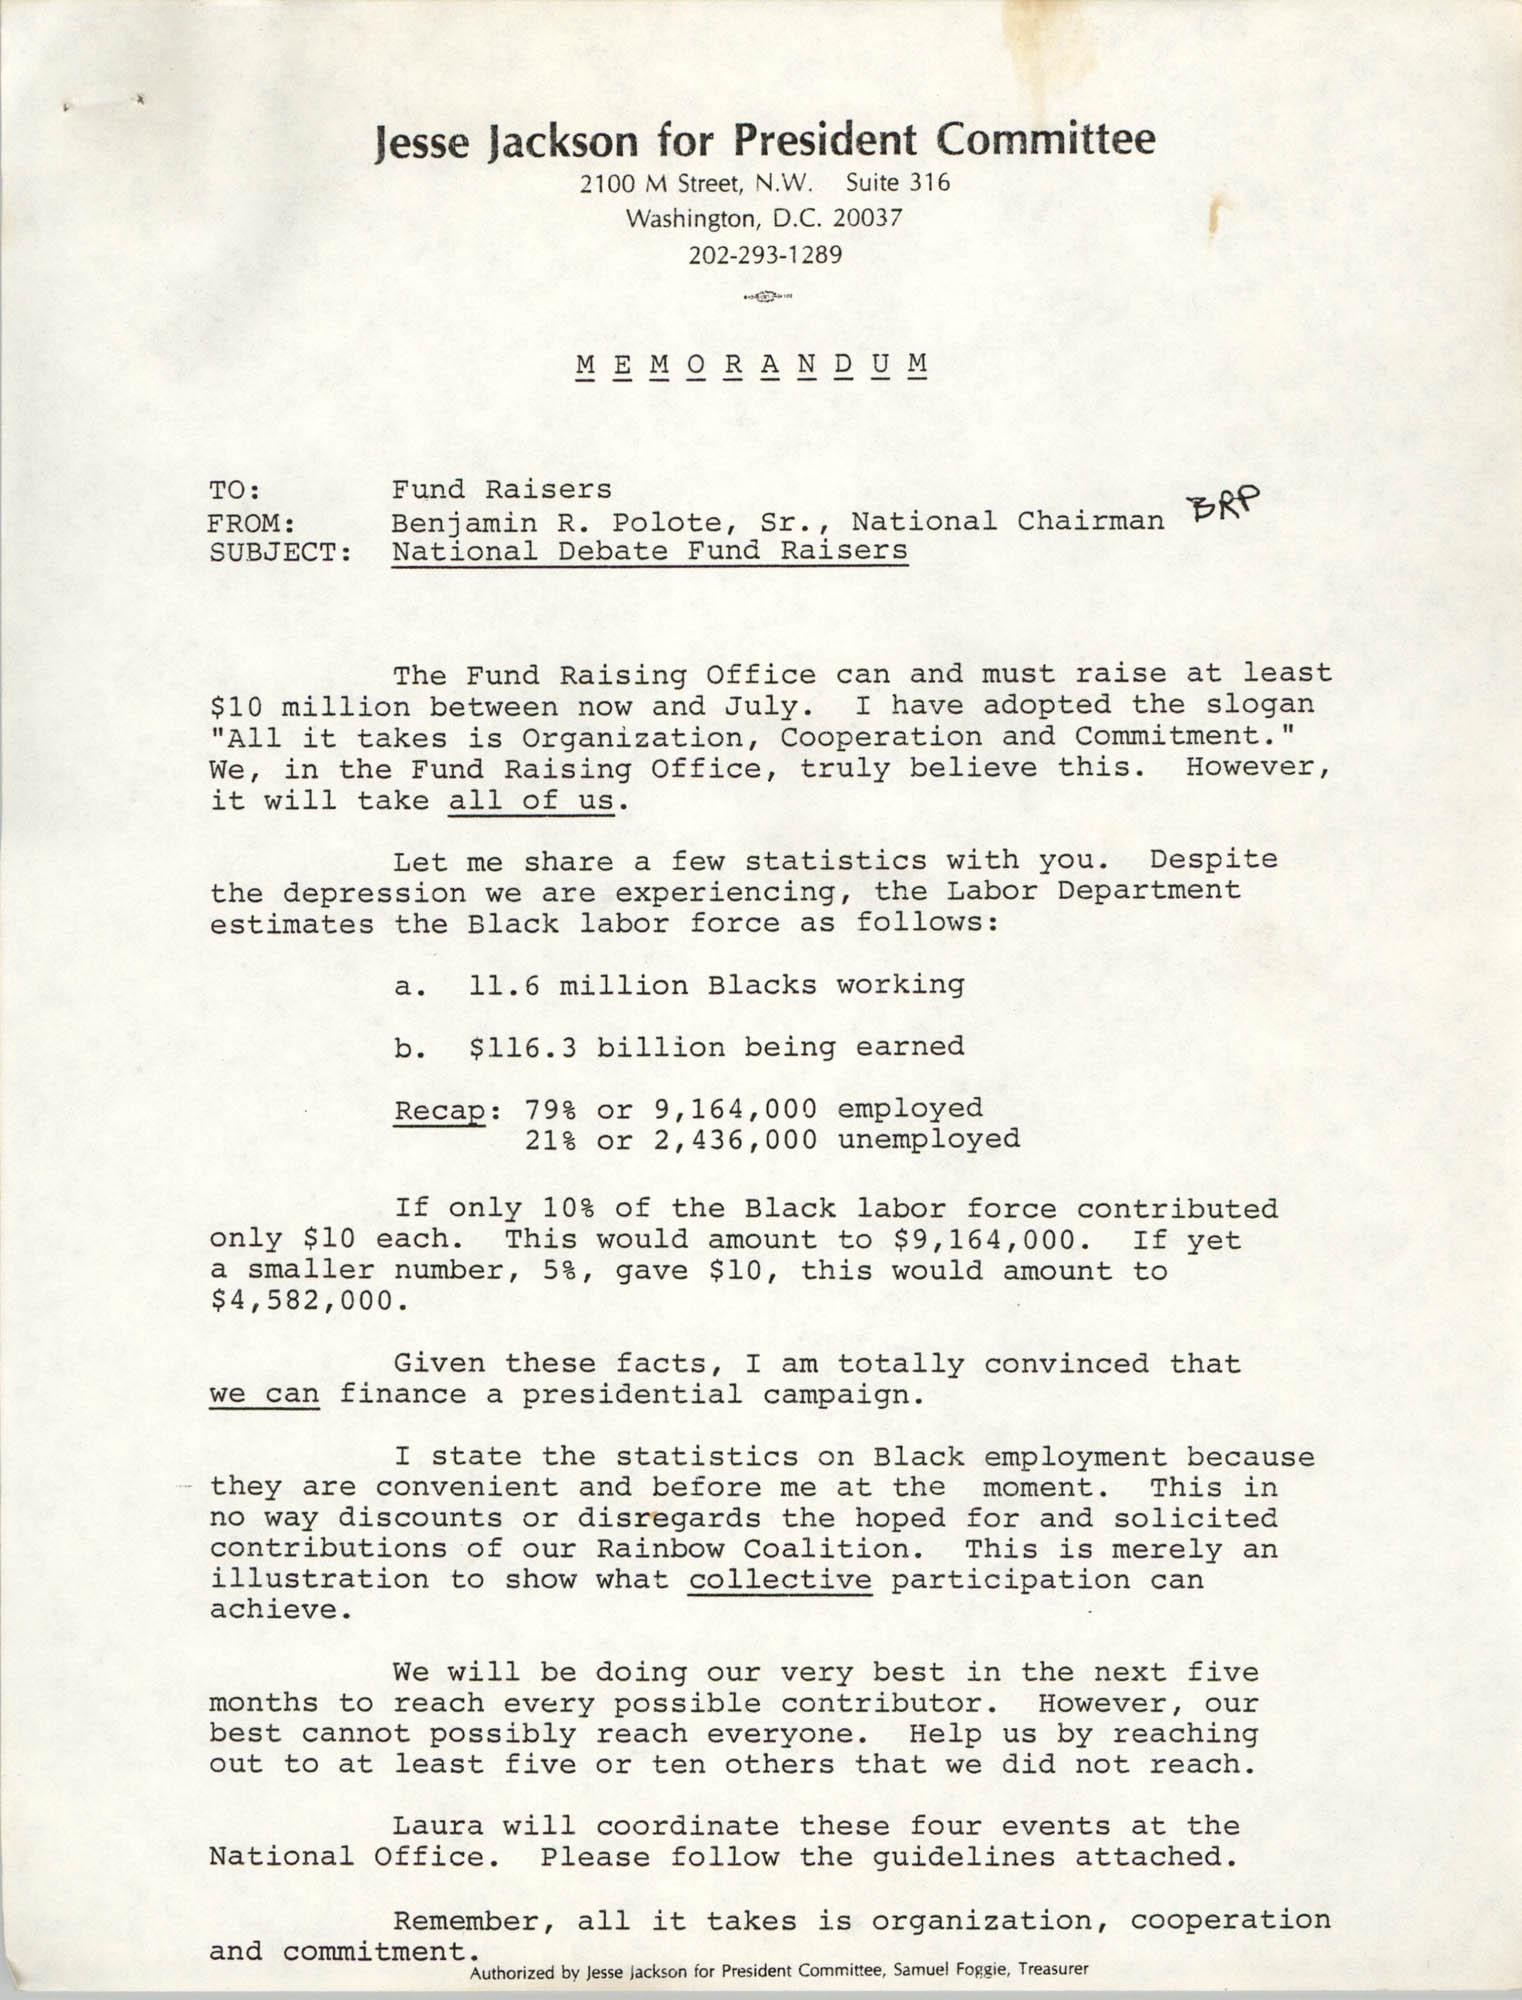 Jesse Jackson for President Committee Memorandum